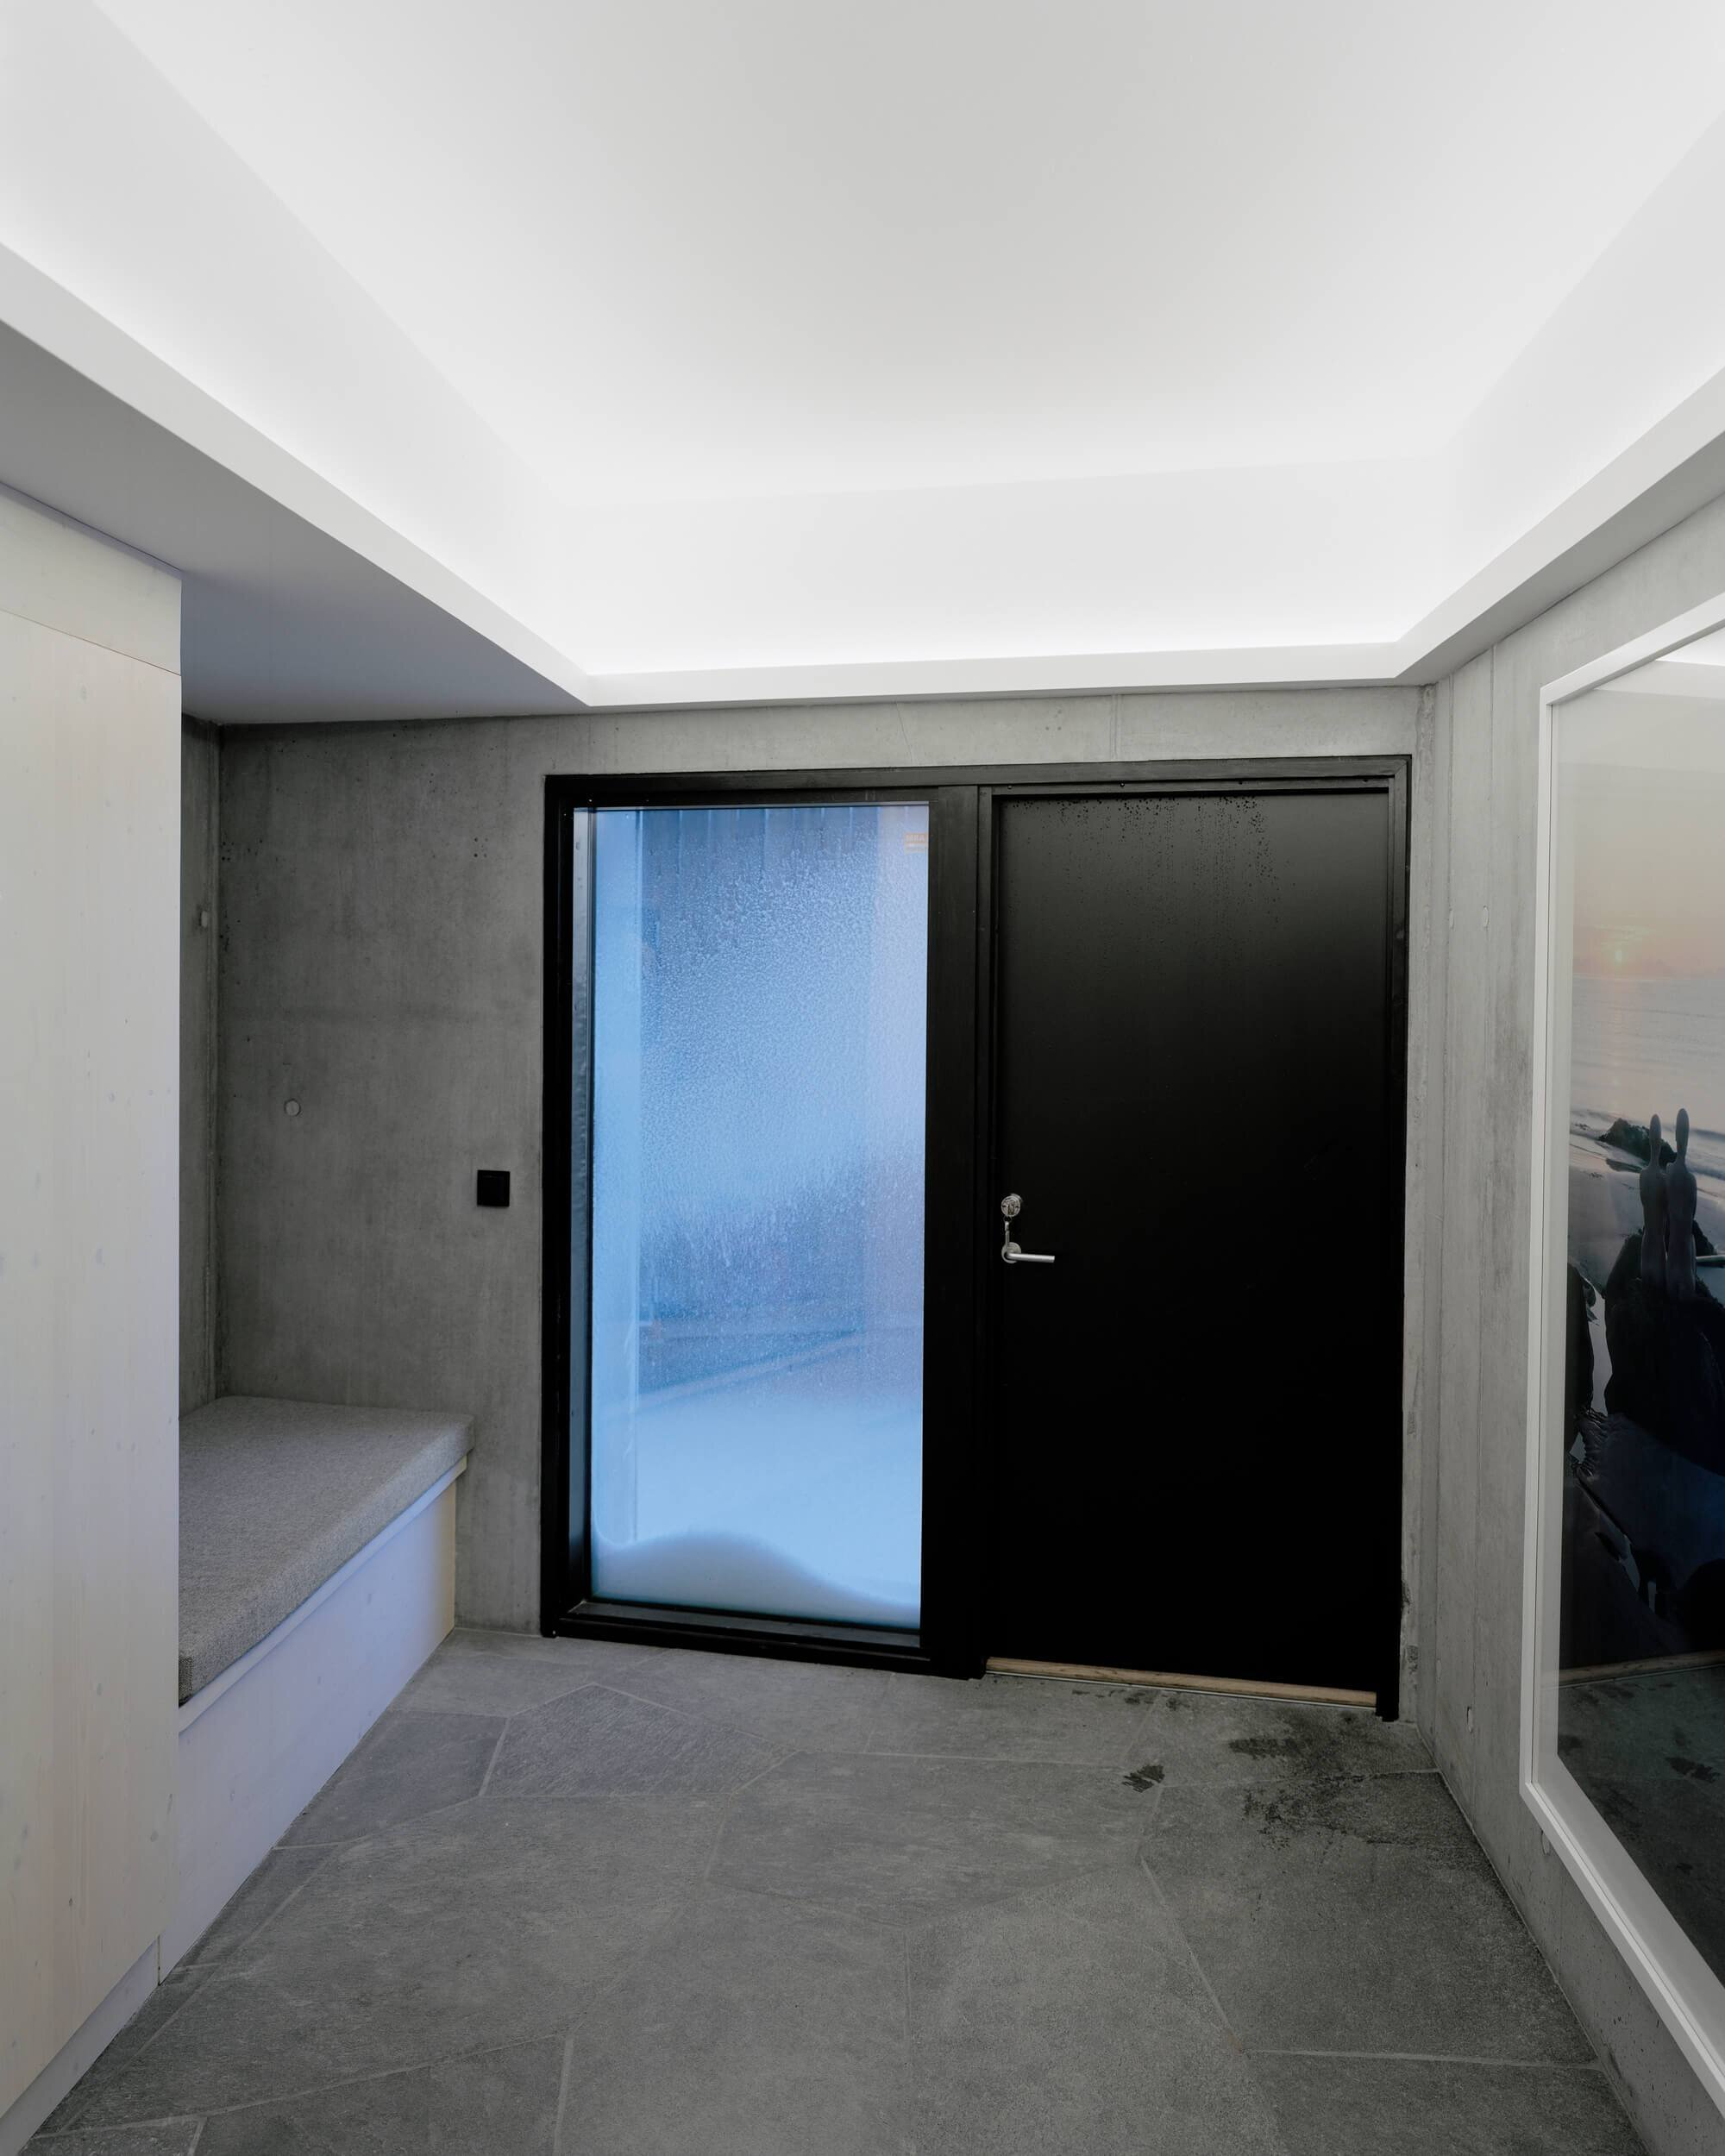 Gubrandslie-Cabin-Helen-&-Hard-architects-Norway-13